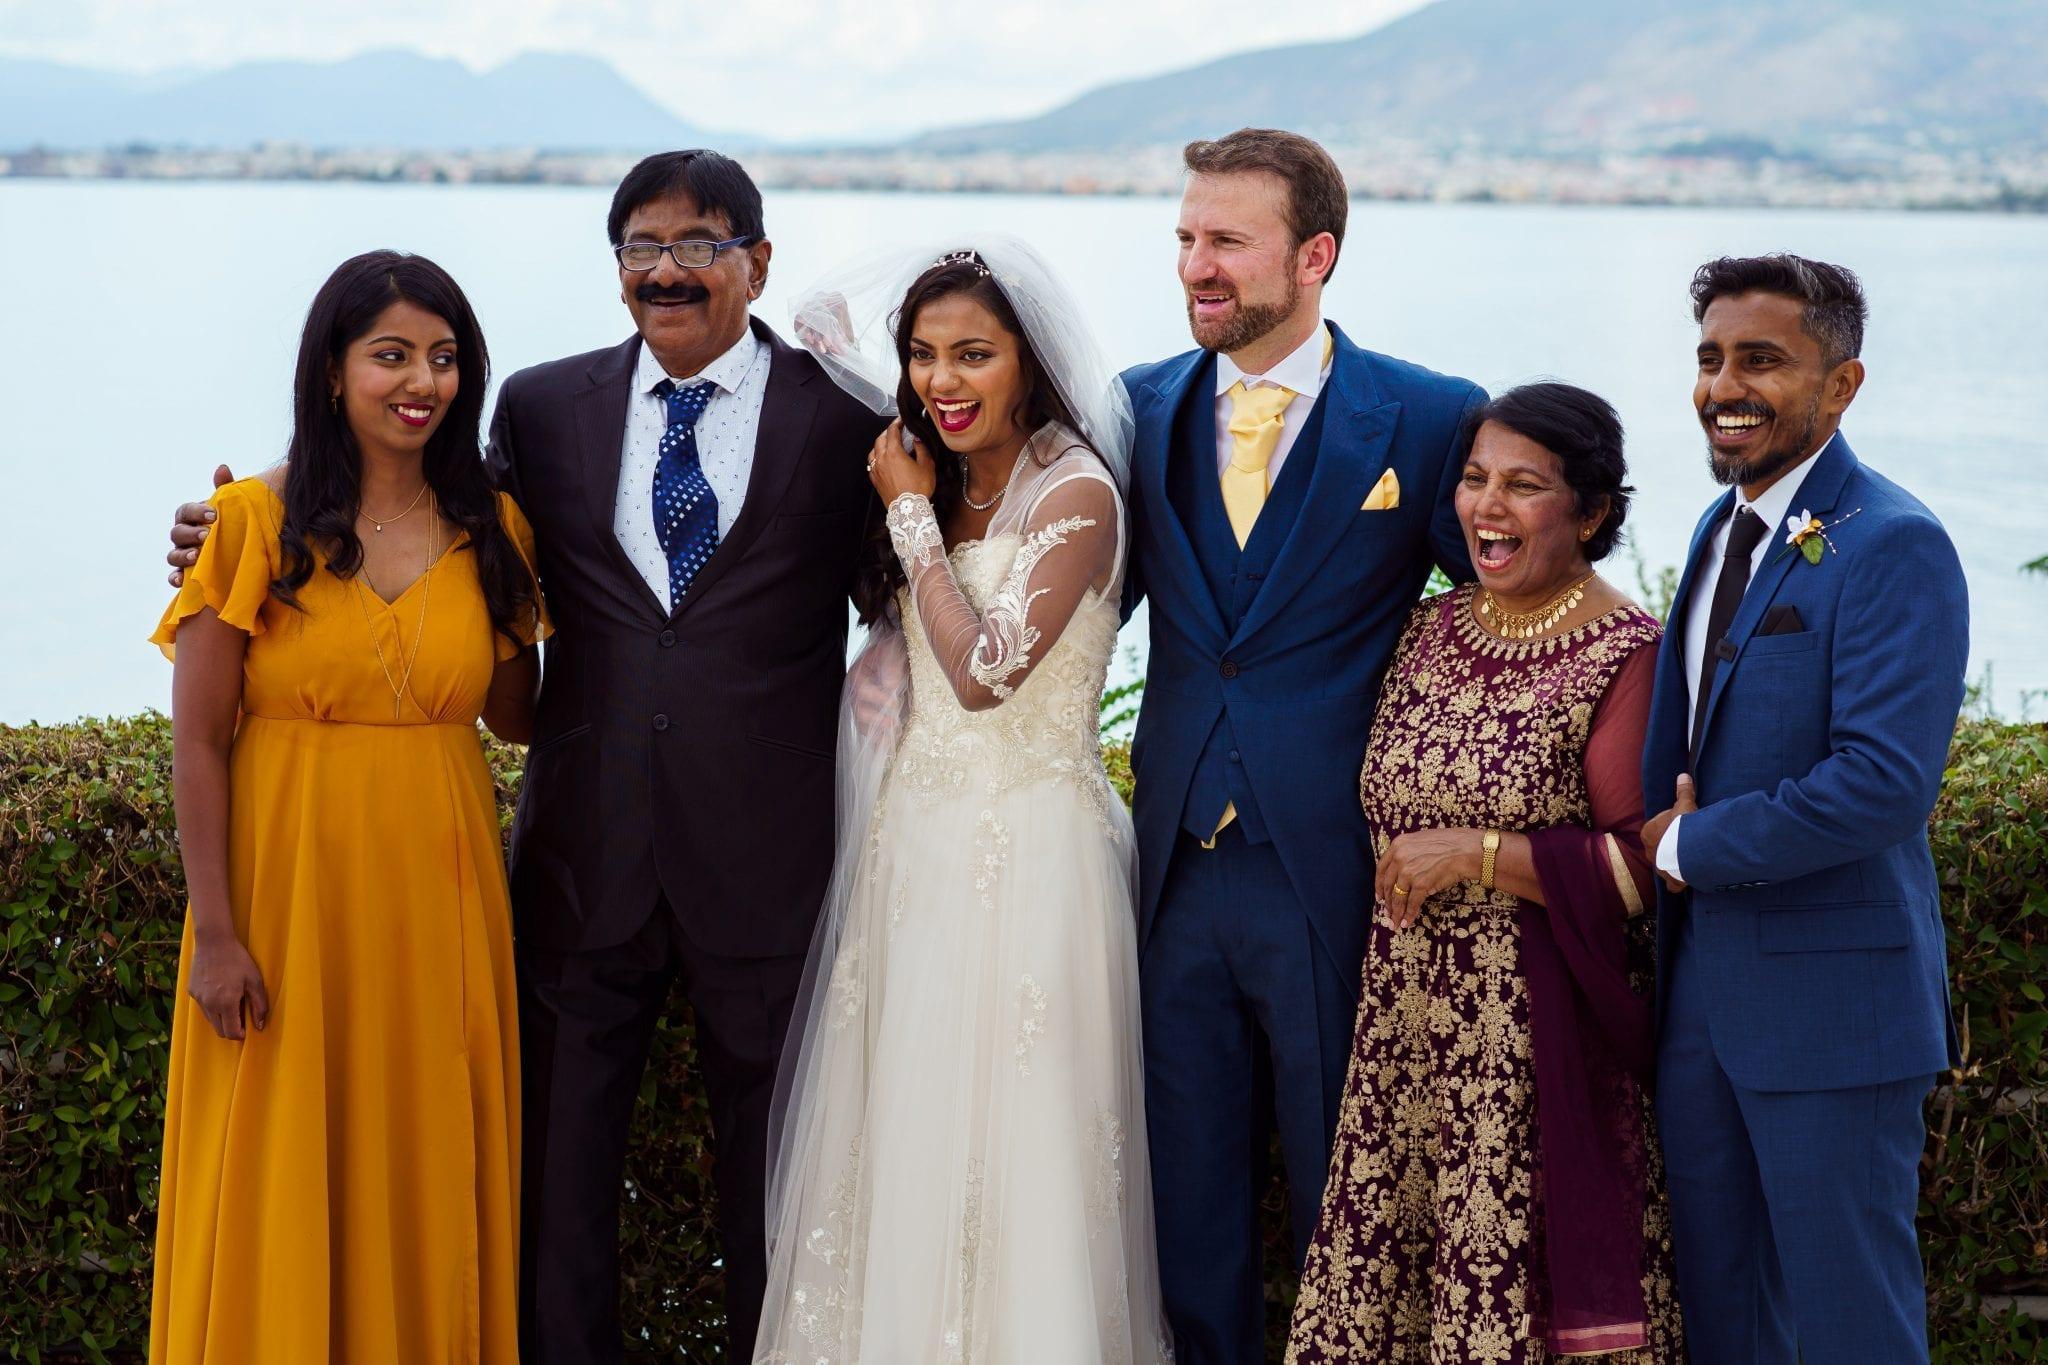 Destination Wedding Photography - Family Portrait